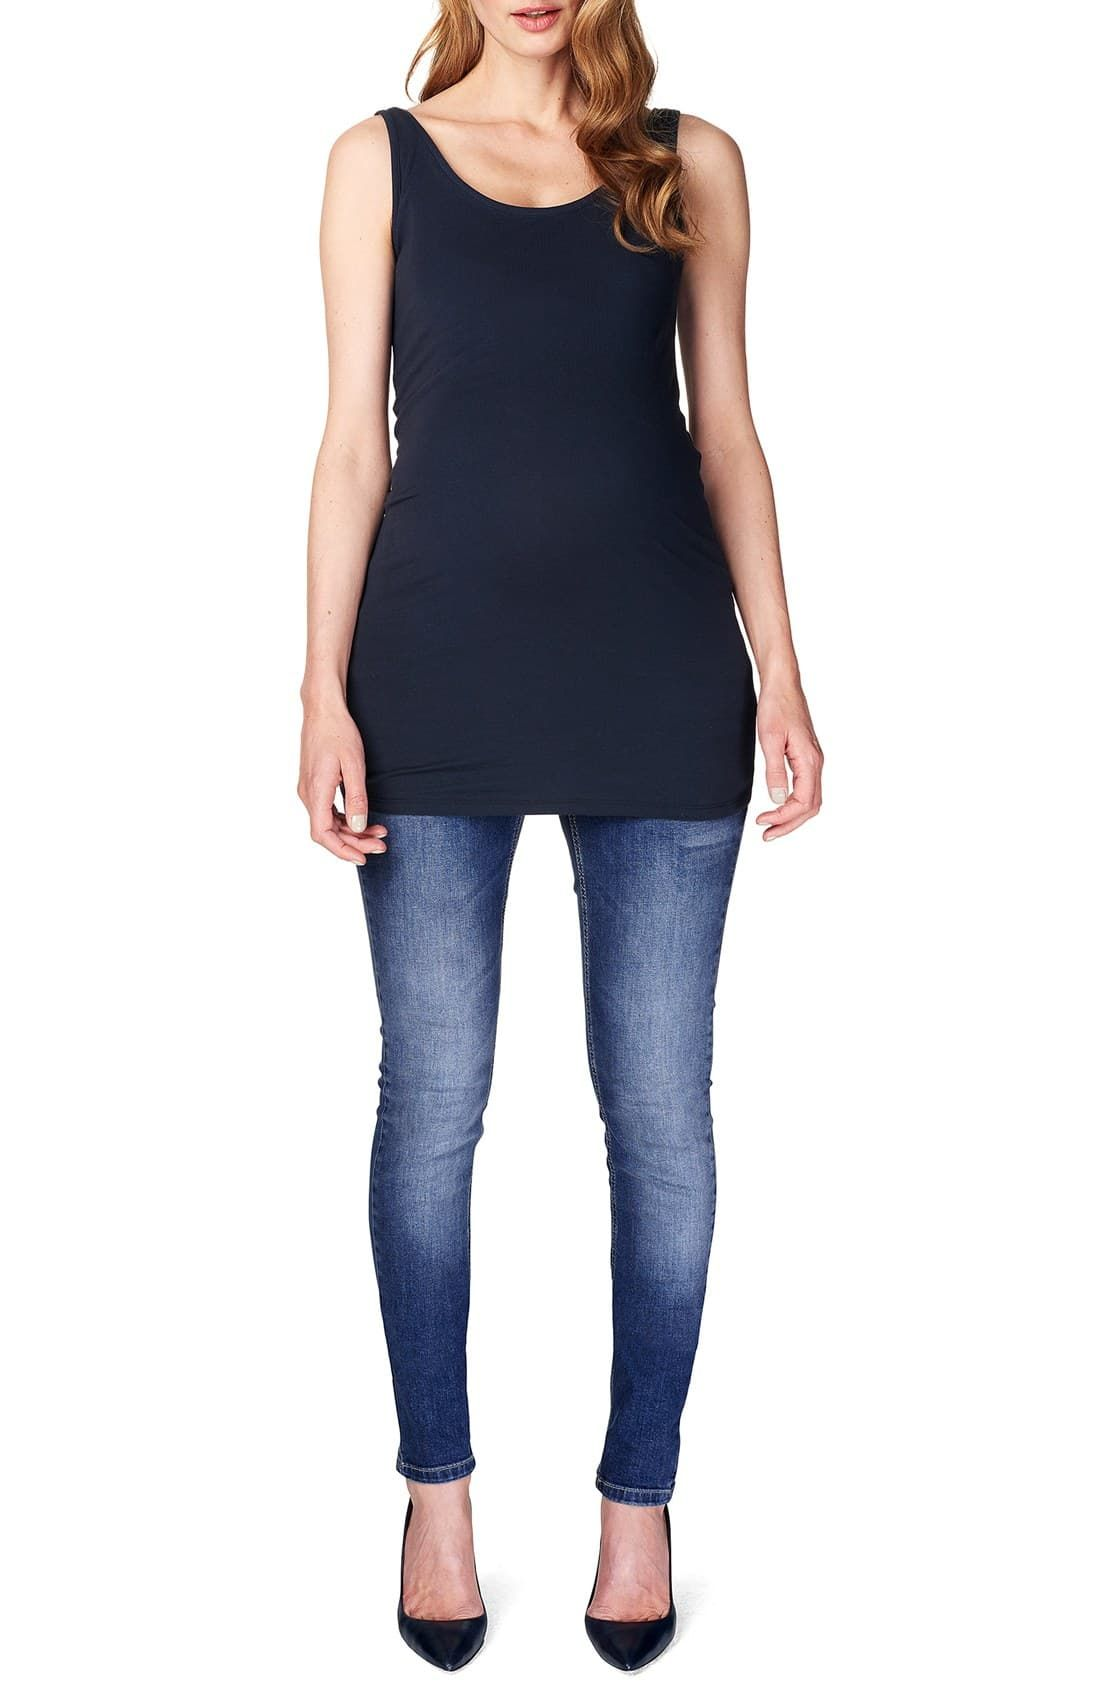 vrp/_trading Stretchy Maternity Leggings Over Bump Full Length Size 10 12 14 16//18 20//22 24//26 Black